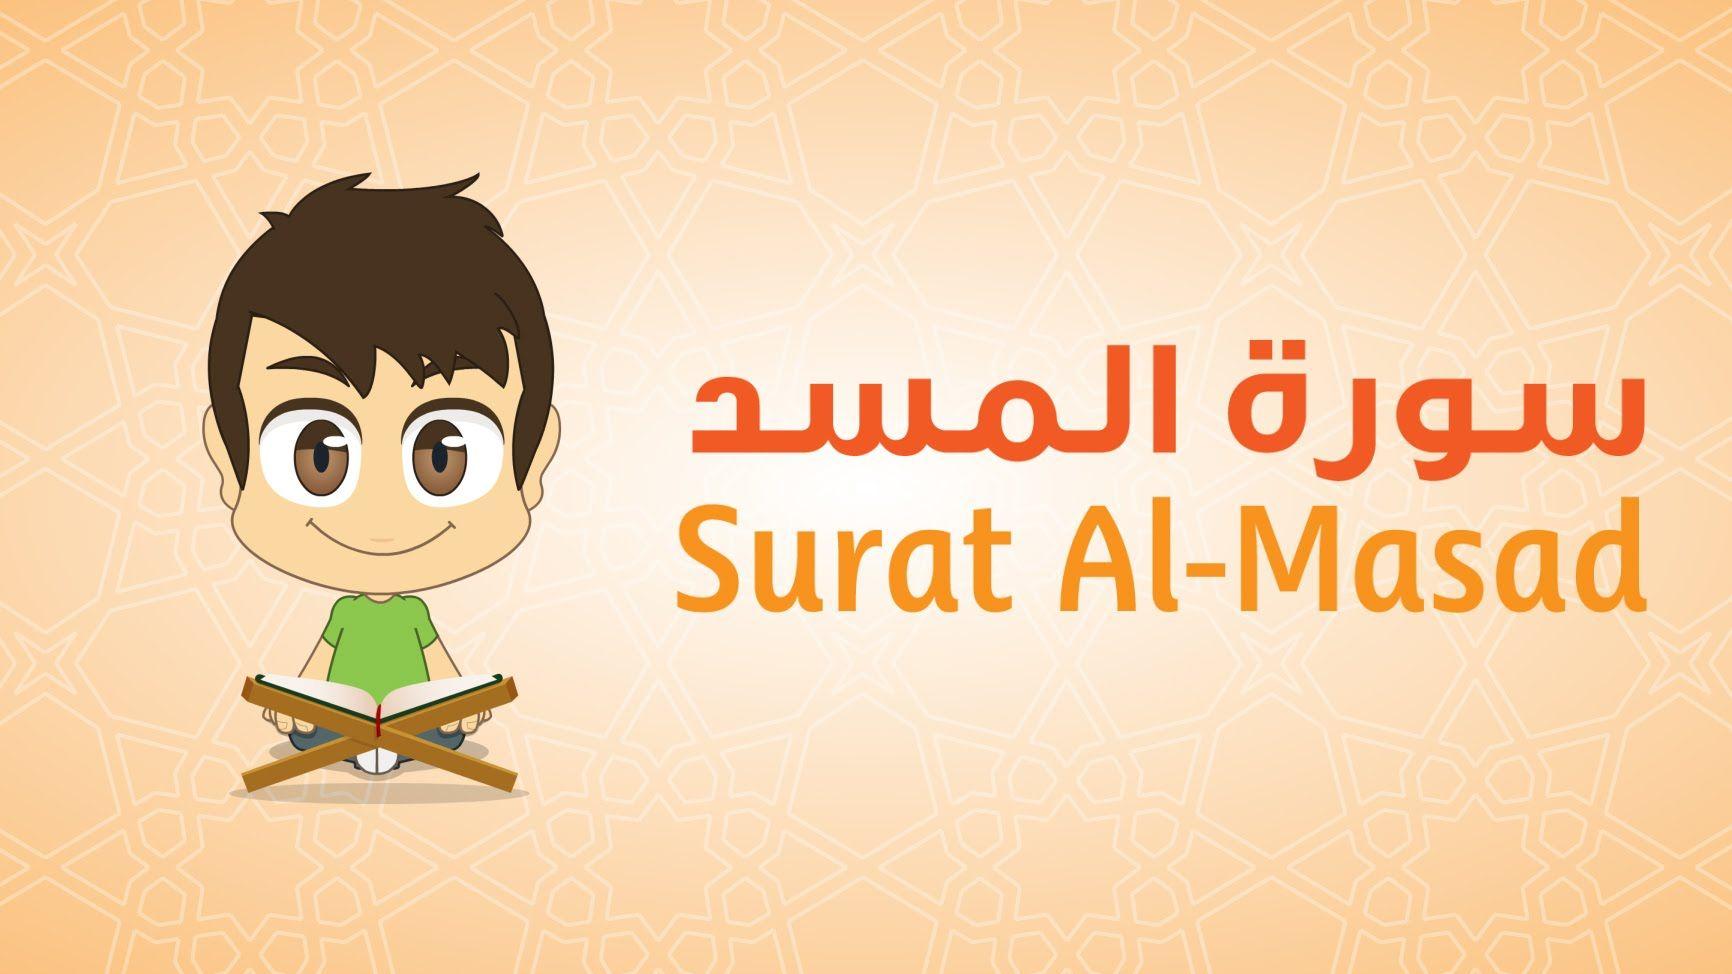 Quran For Kids Learn Surat Al Masad 111 القرآن الكريم للأطفال تعل م سورة المسد Learn Quran Kids Series Learning